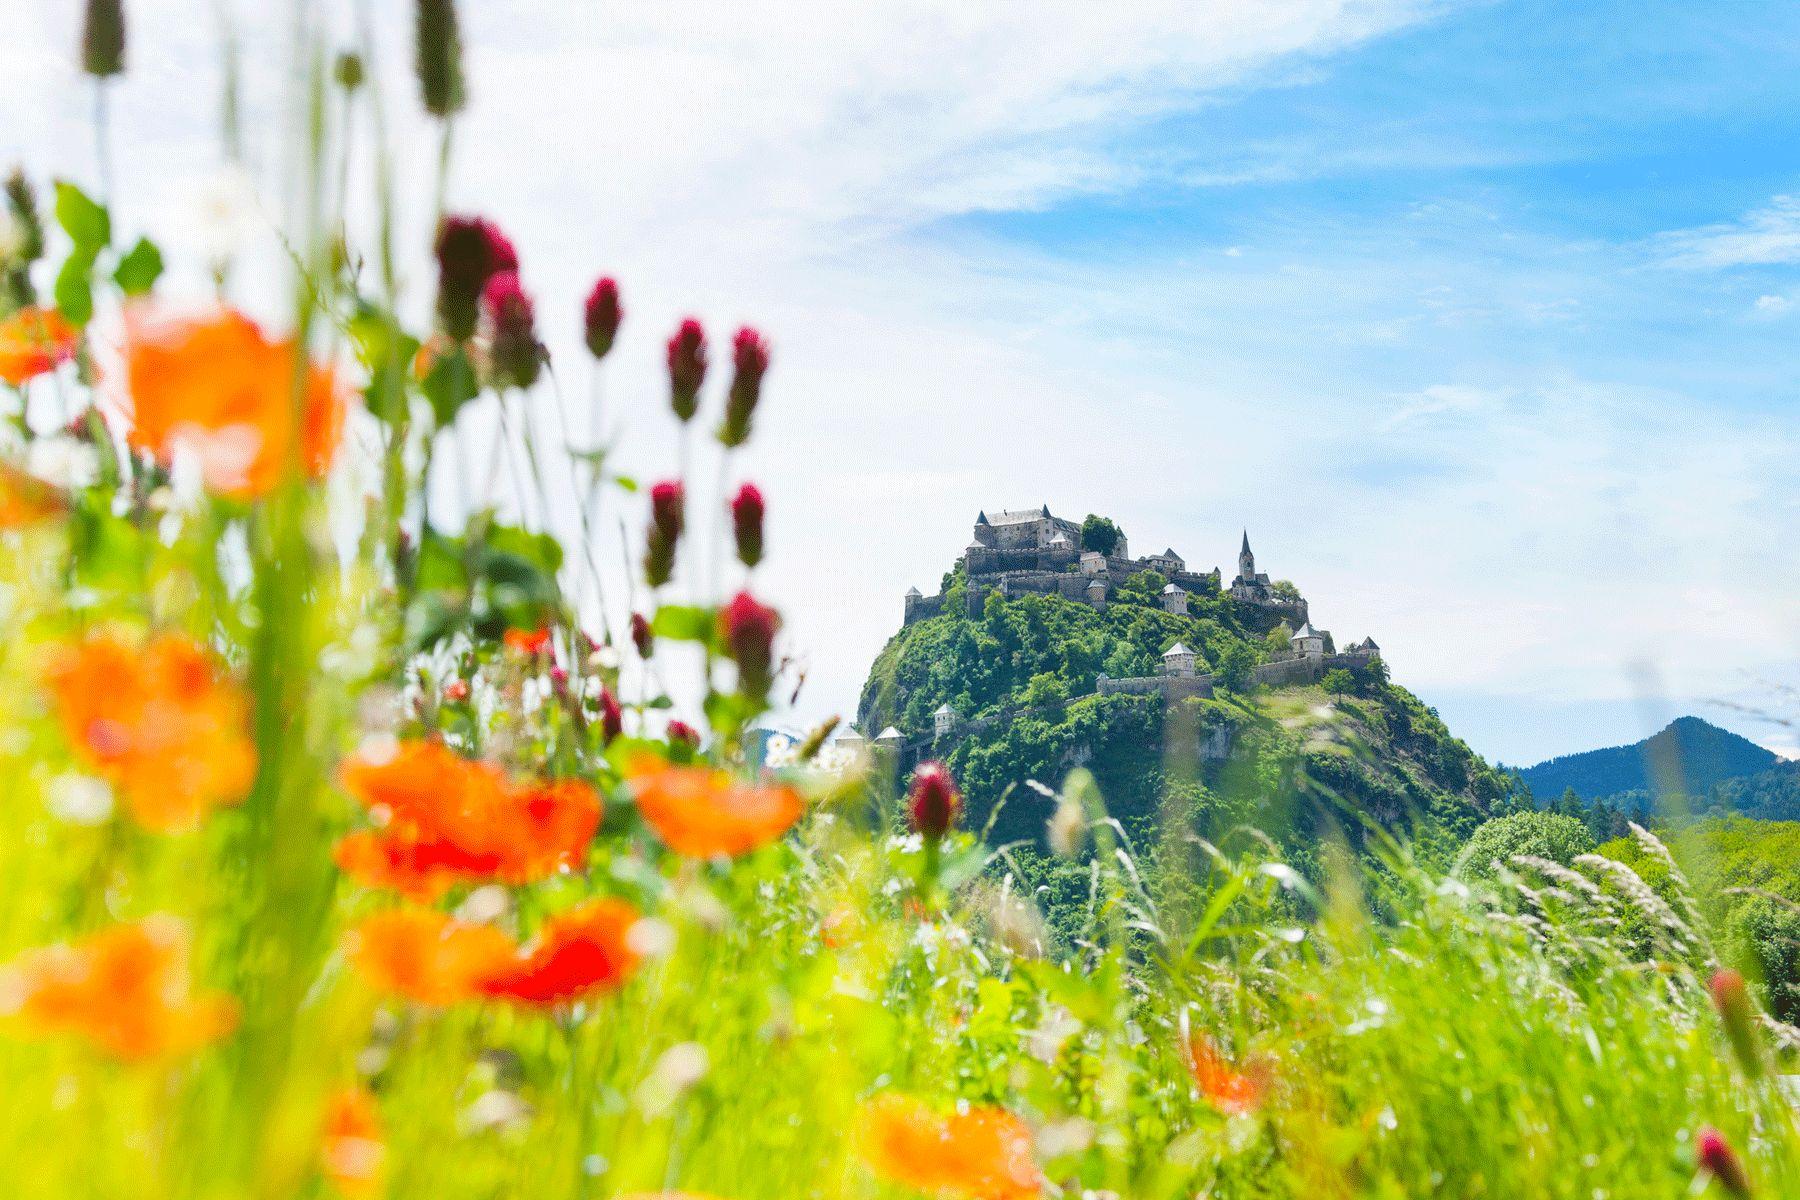 Burg Hochosterwitz Mohnblumen iStock485630077 web